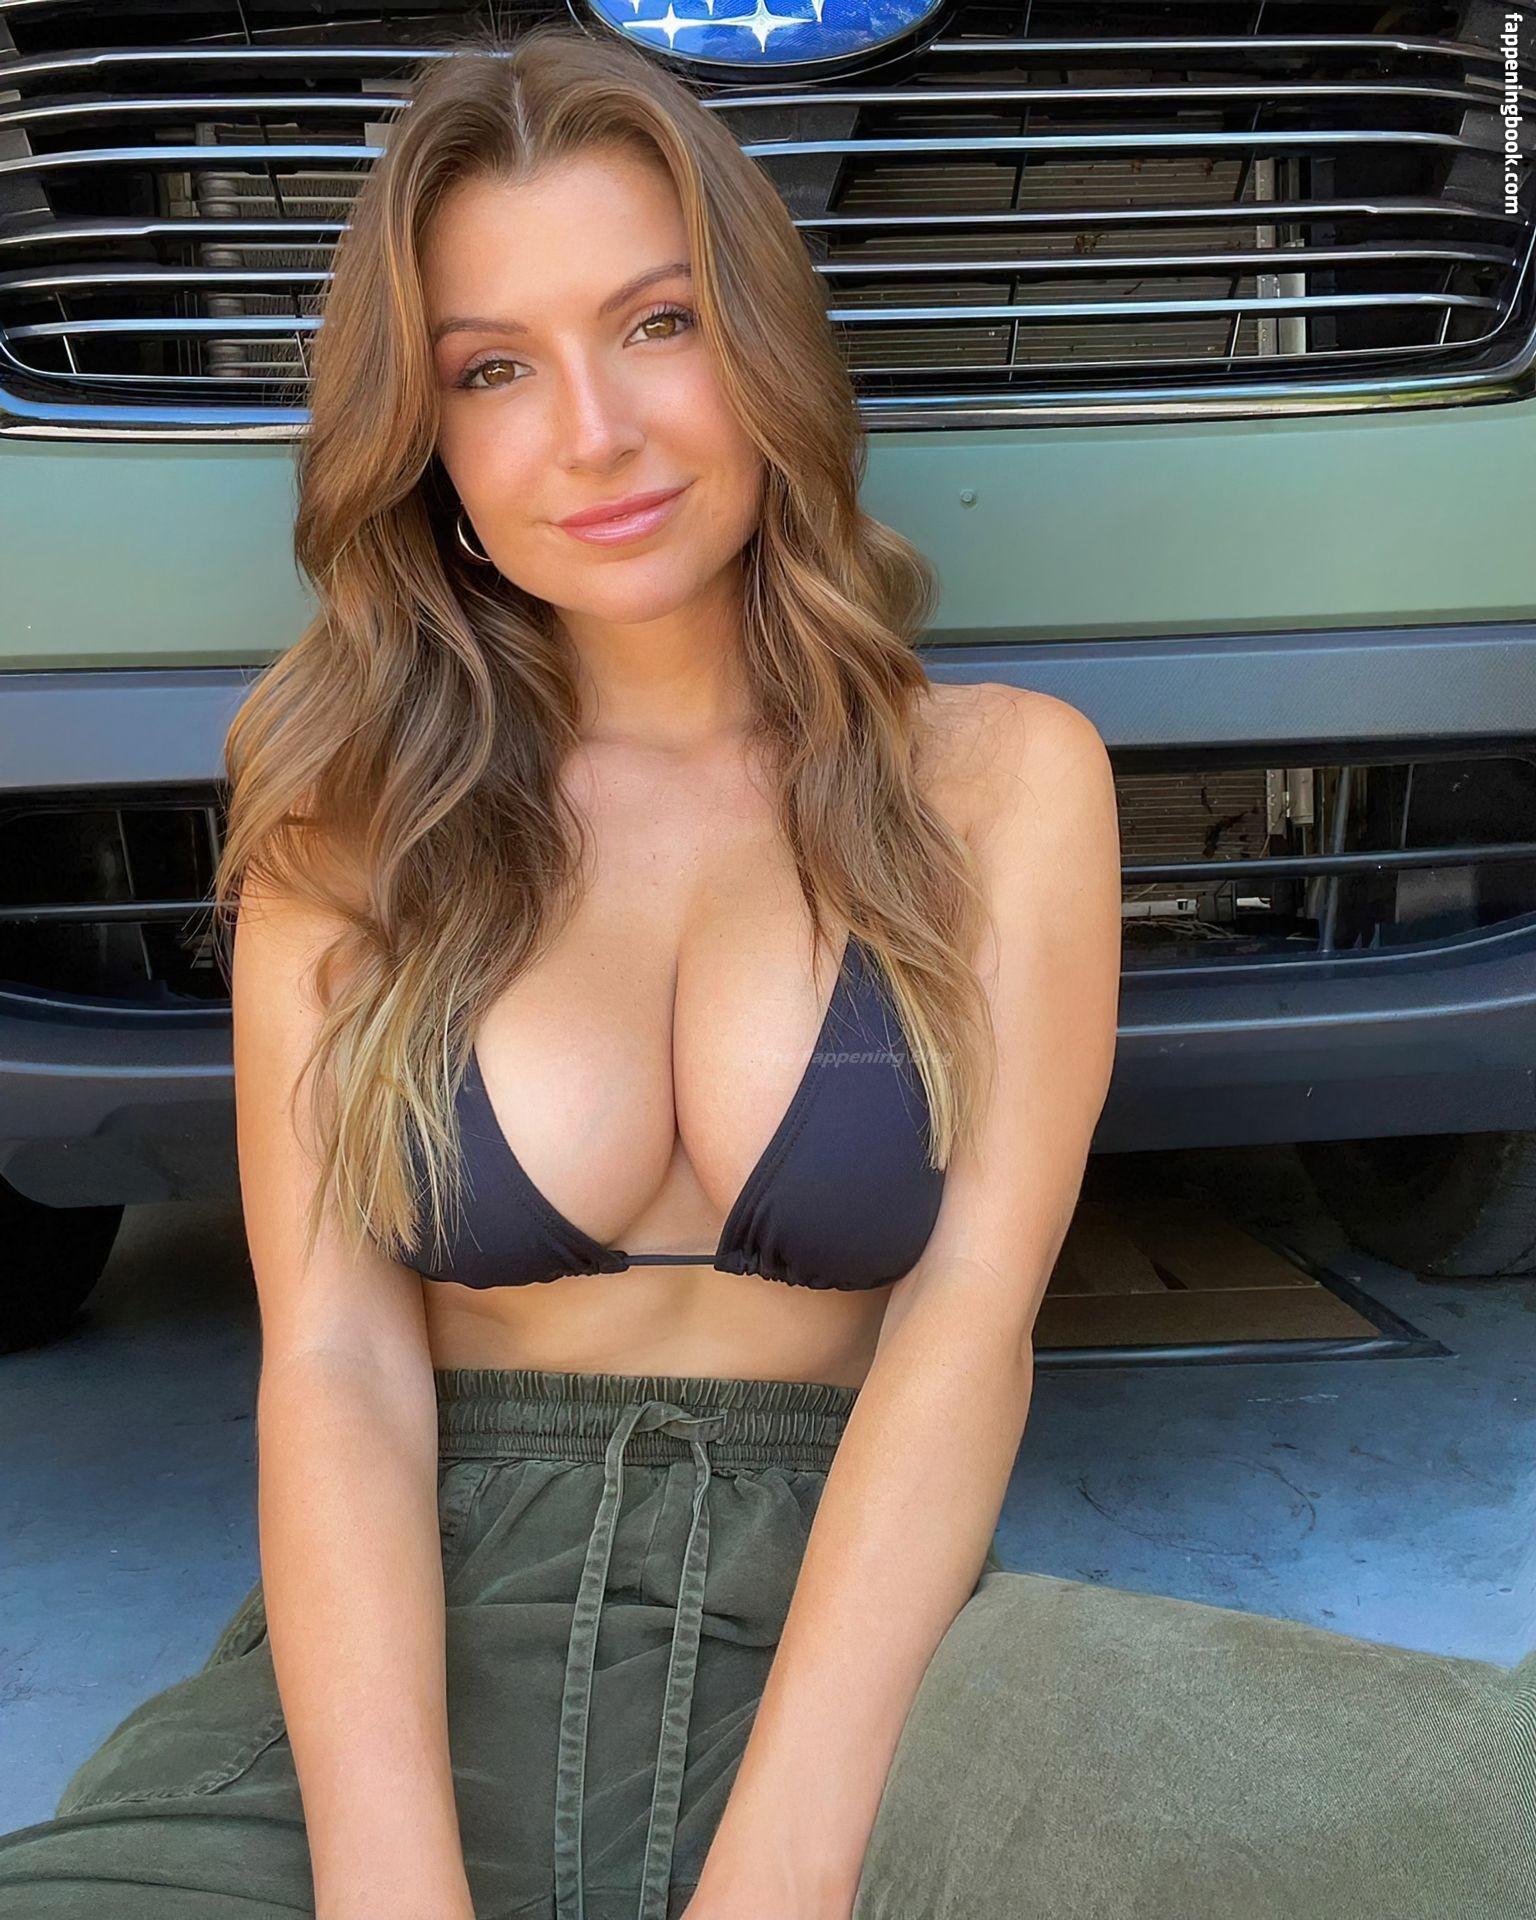 Sofia Bevarly Nude